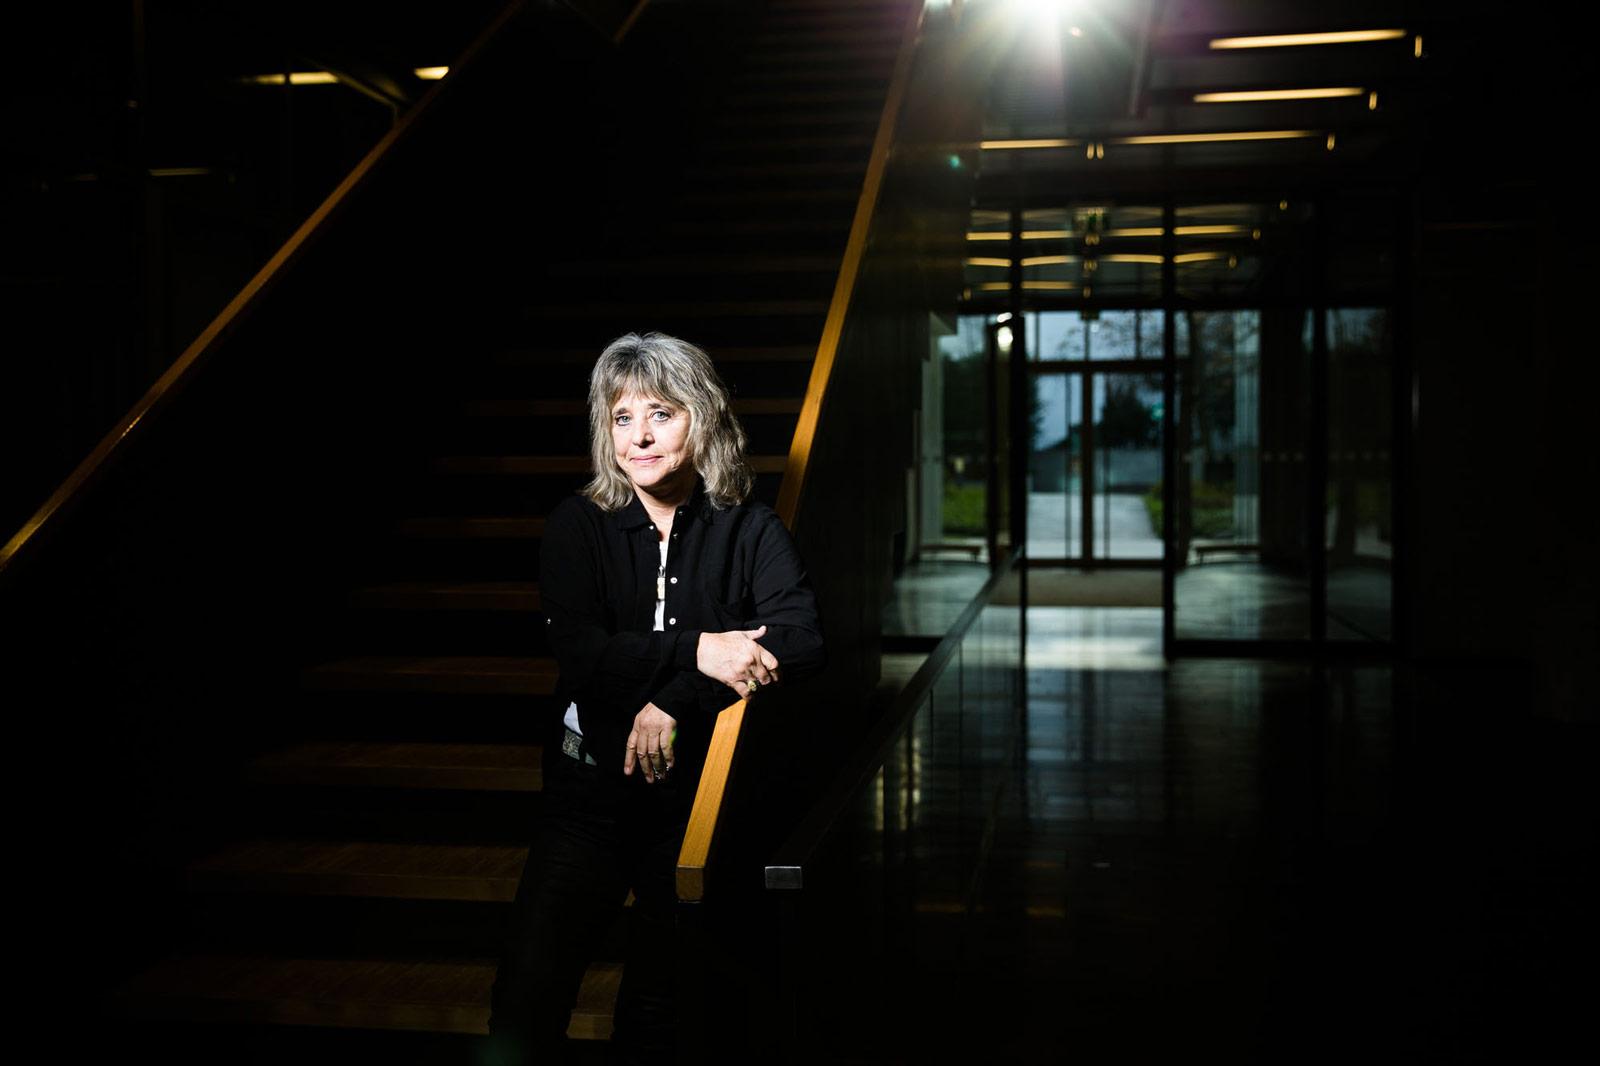 Suzi Quatro, Musikerin